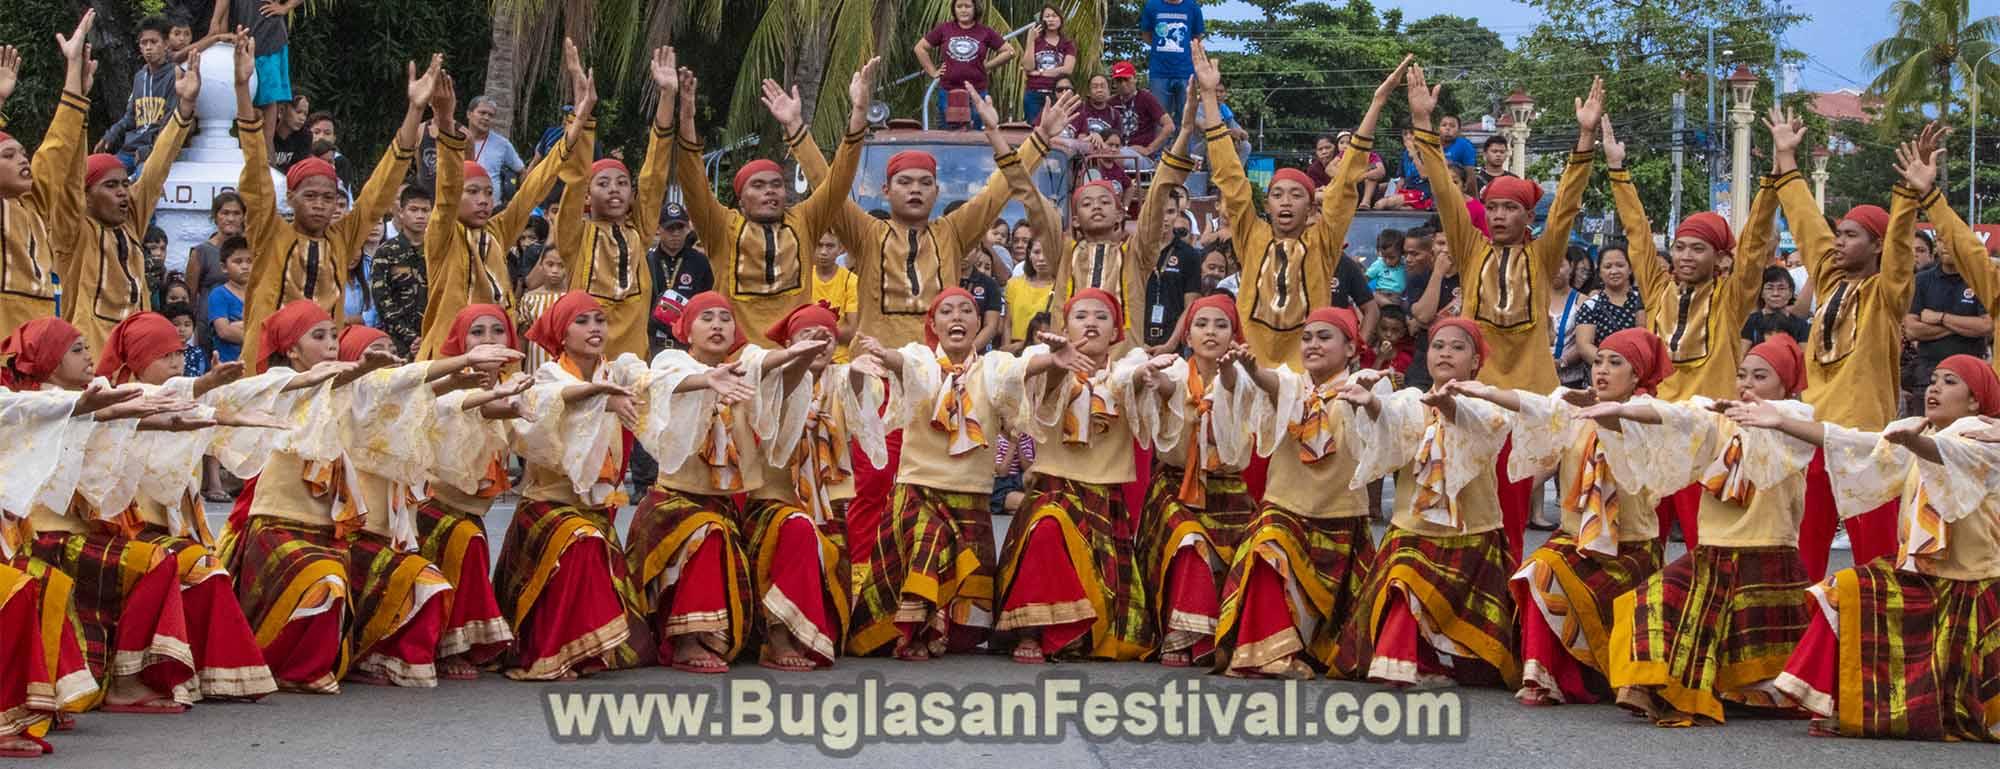 Sandurot Festival 2018 - Dumaguete City - Negros Oriental